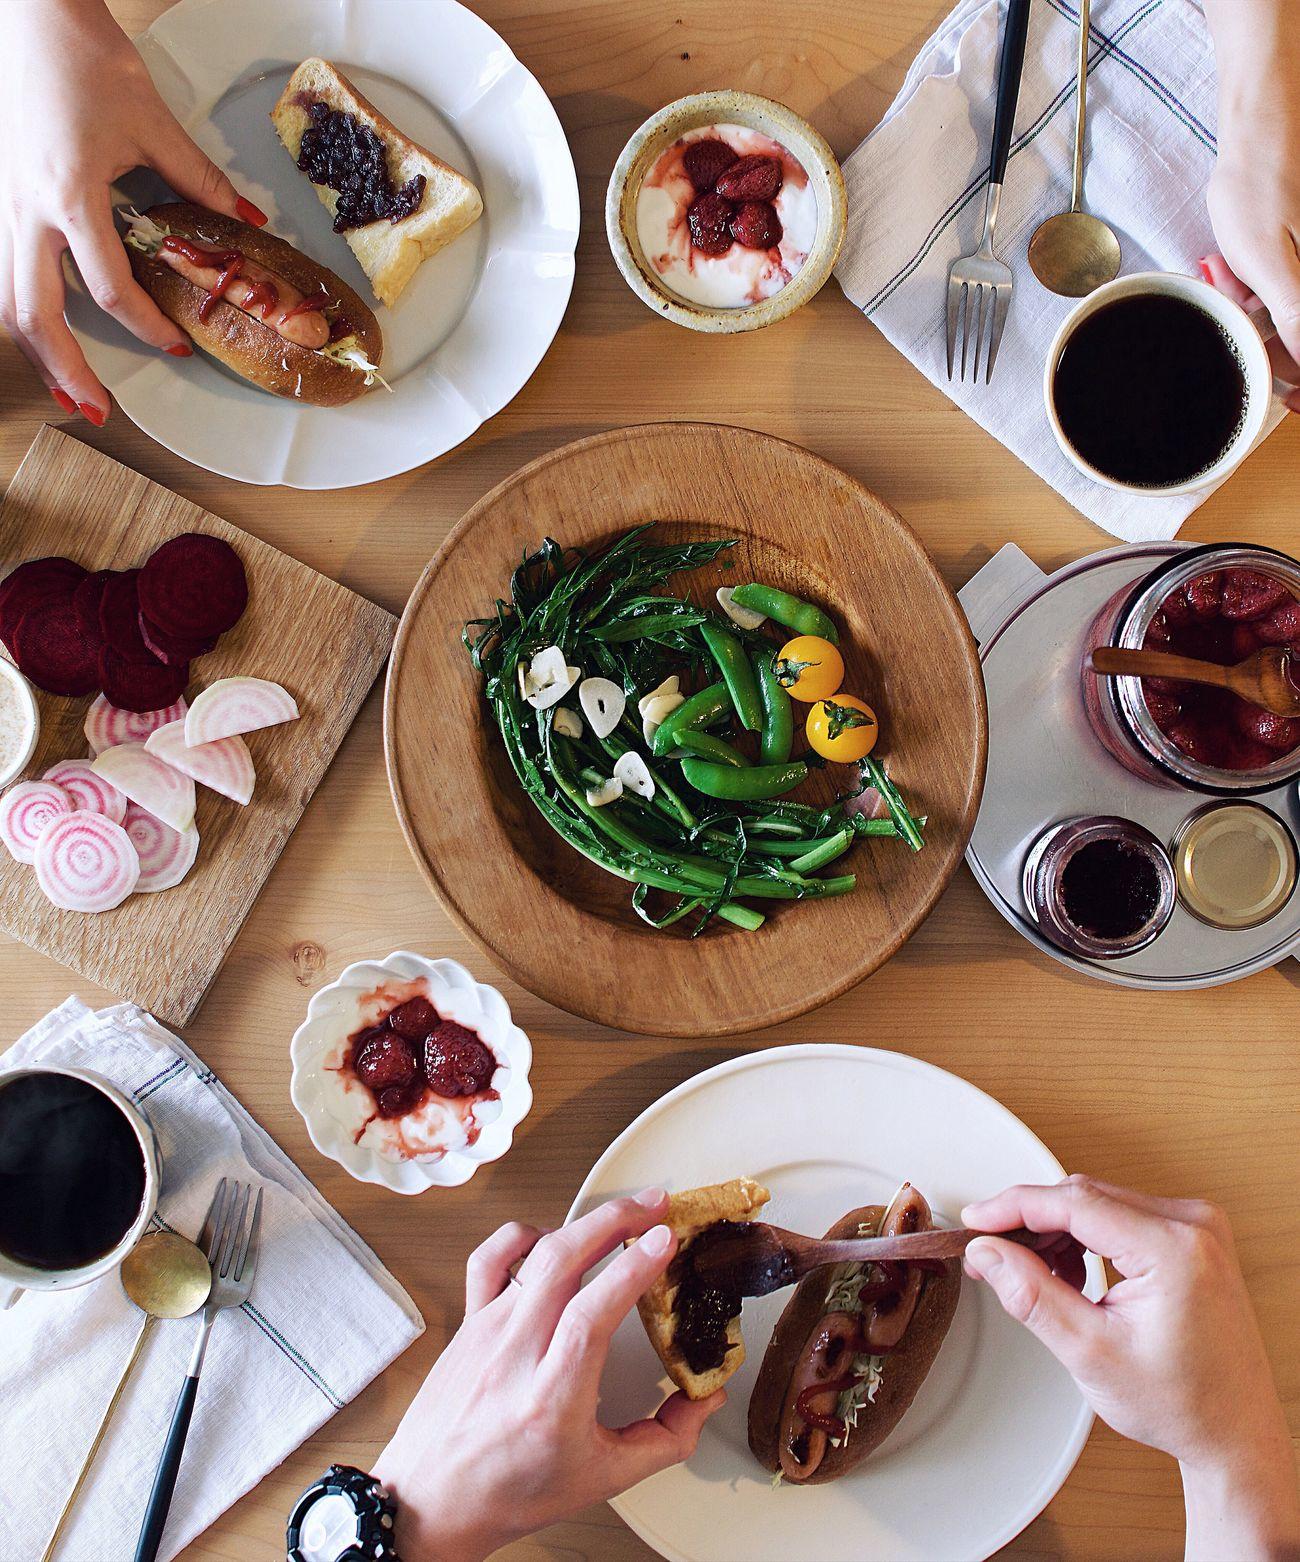 Japan Onmytable Onthetable Life Nikon Contrast Table Food Foodstyling 朝食 食卓 おうちカフェ おうちごはん 朝ごはん 暮らし Coffee Morning My Favorite Breakfast Moment Breakfast Interior